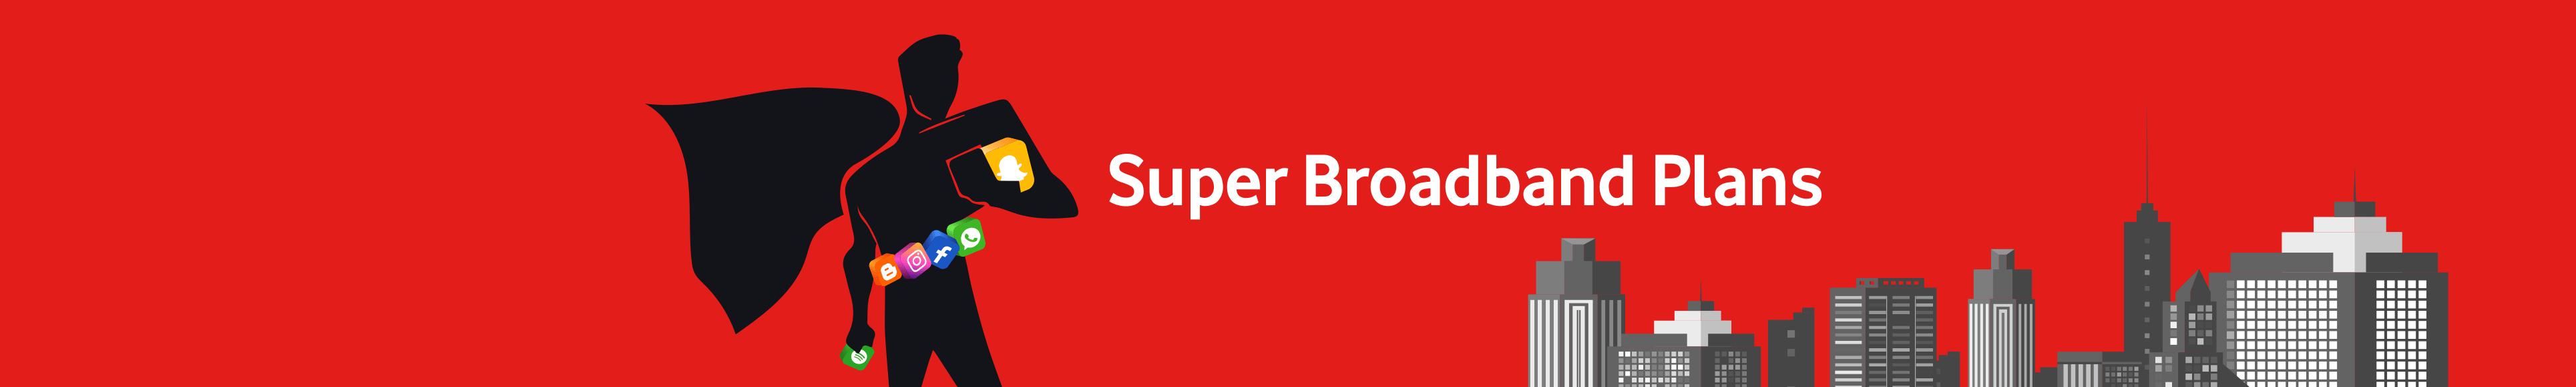 Super Broadband Banner (1)